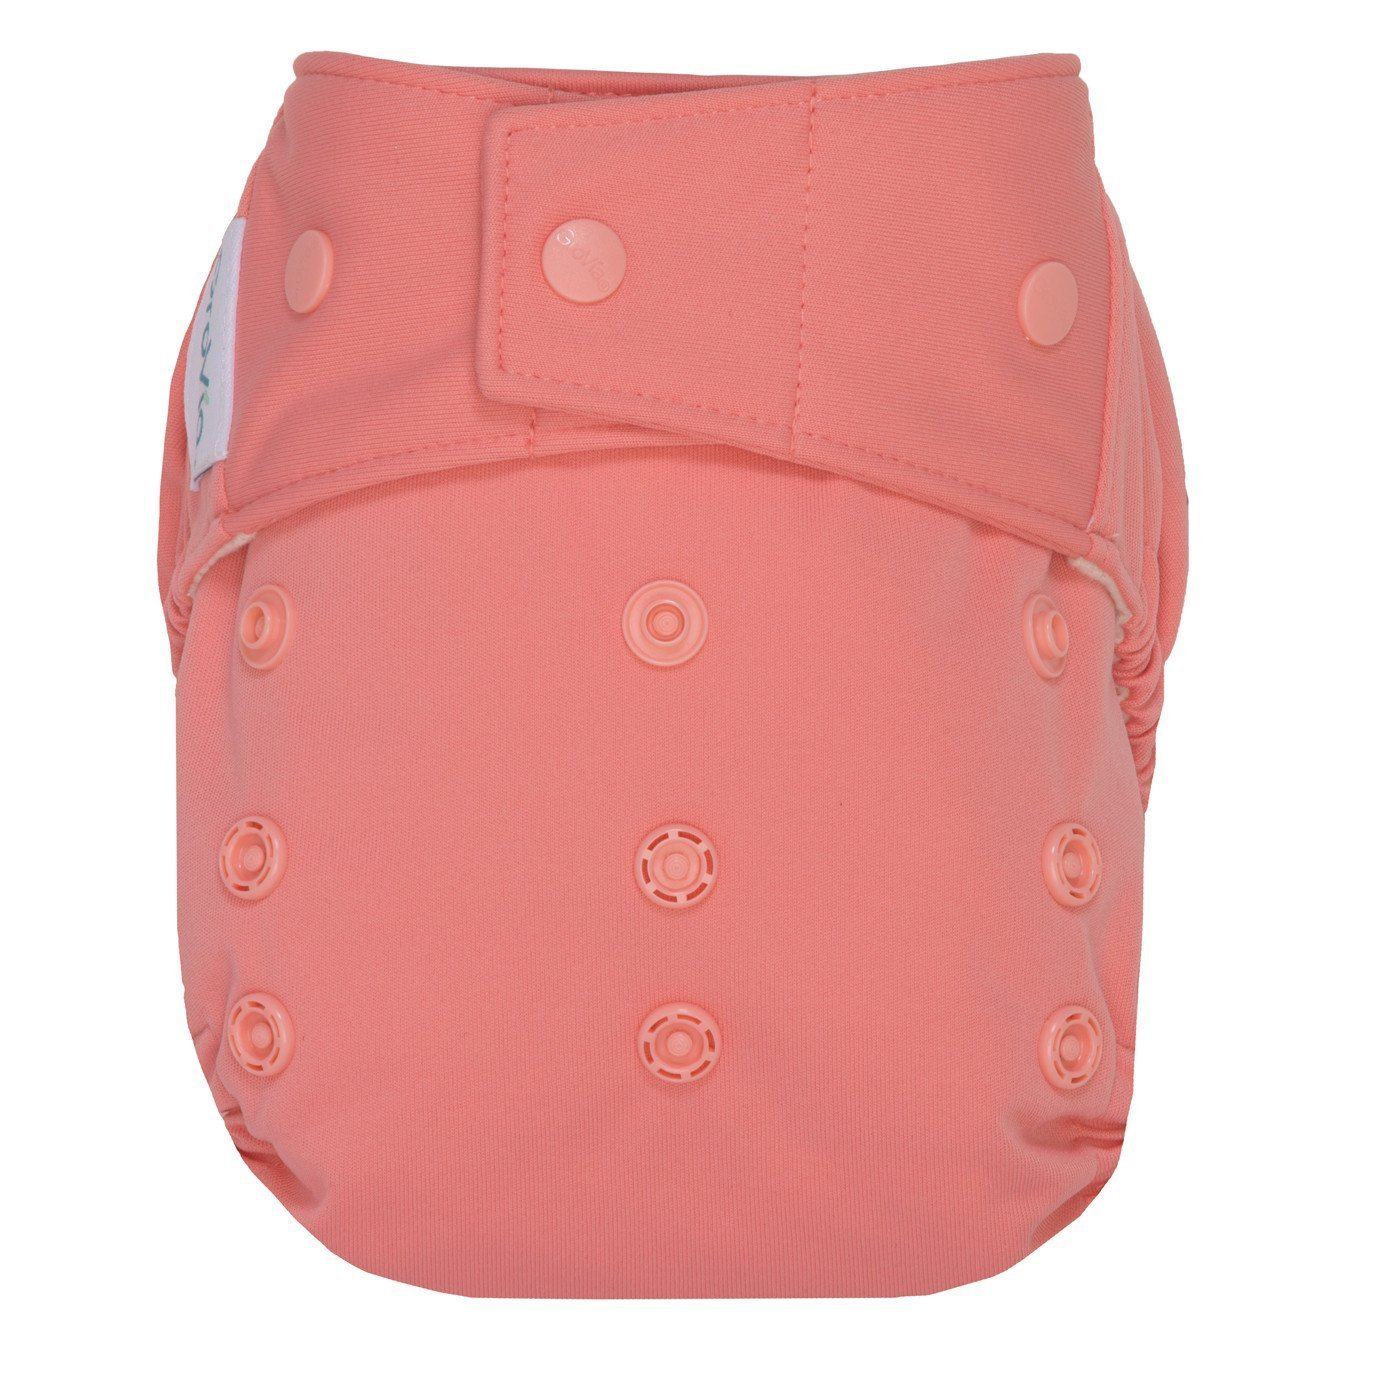 GroVia Hybrid Cloth Diaper Shell, Snap Shell (Rose)